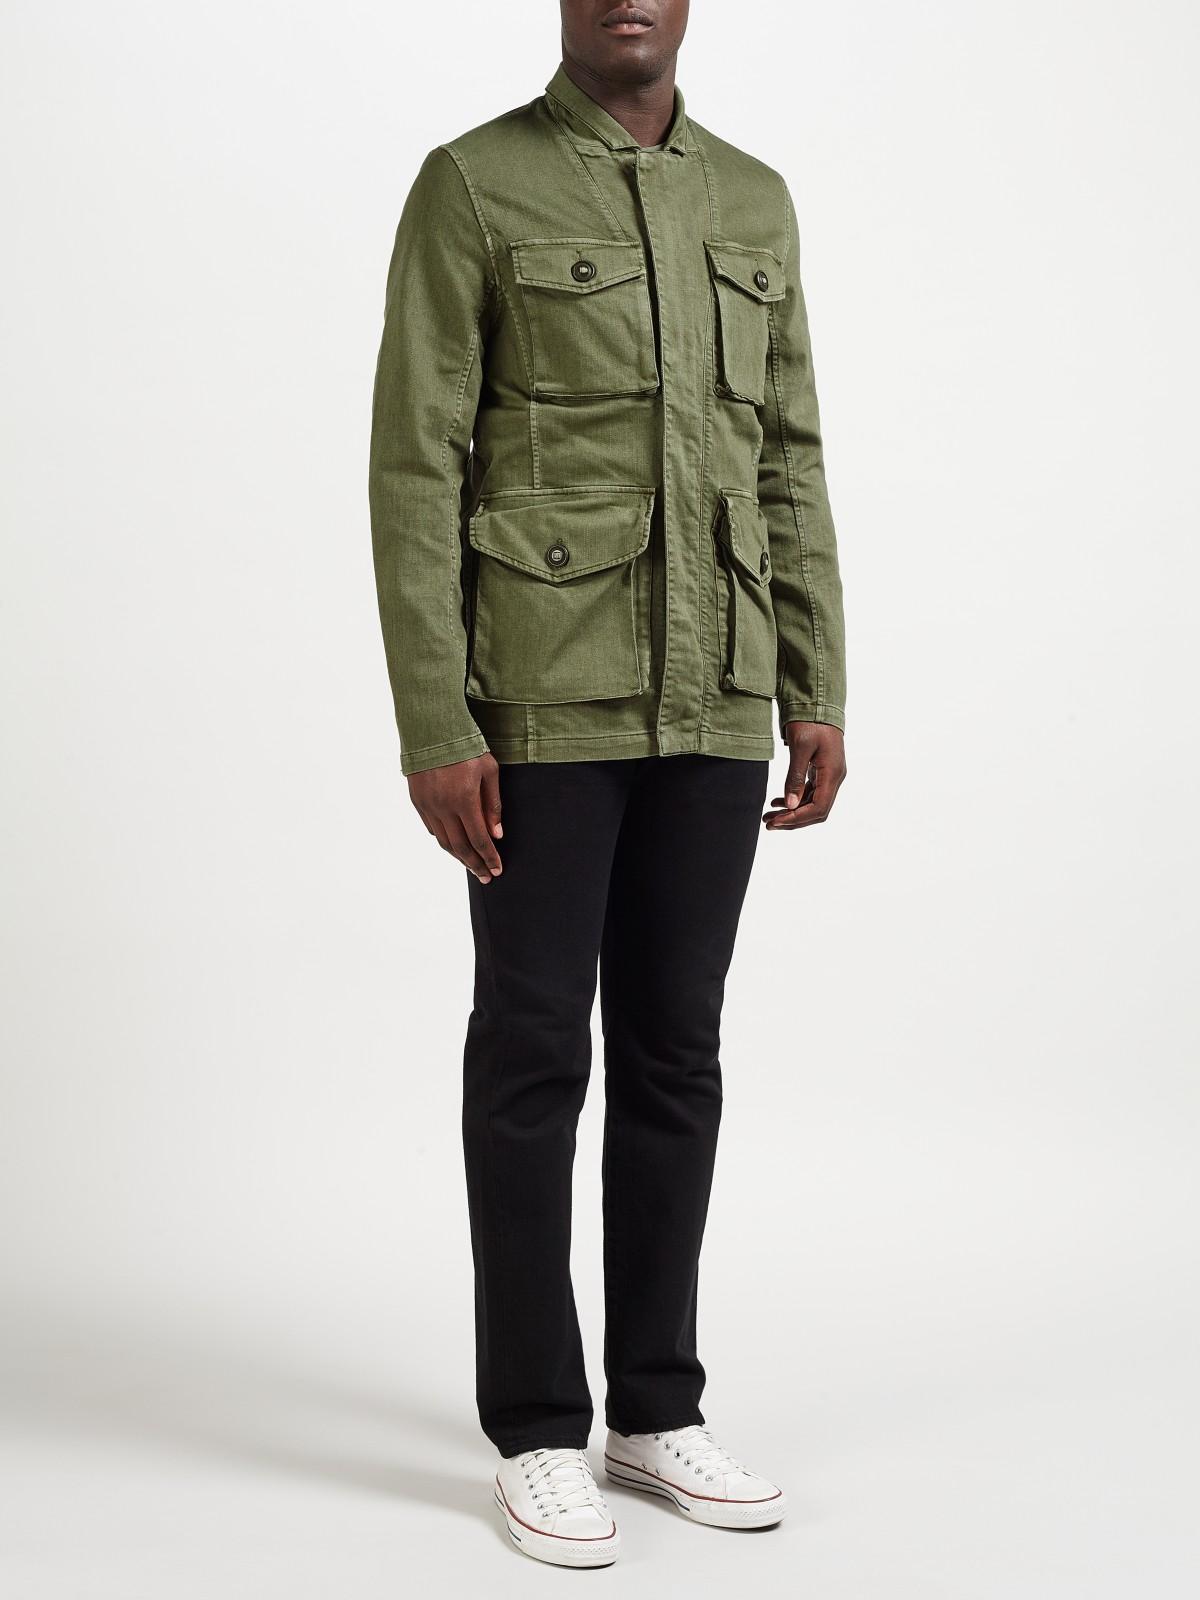 Denham Cotton V65 Jacket Tsc in Legion Green (Green) for Men